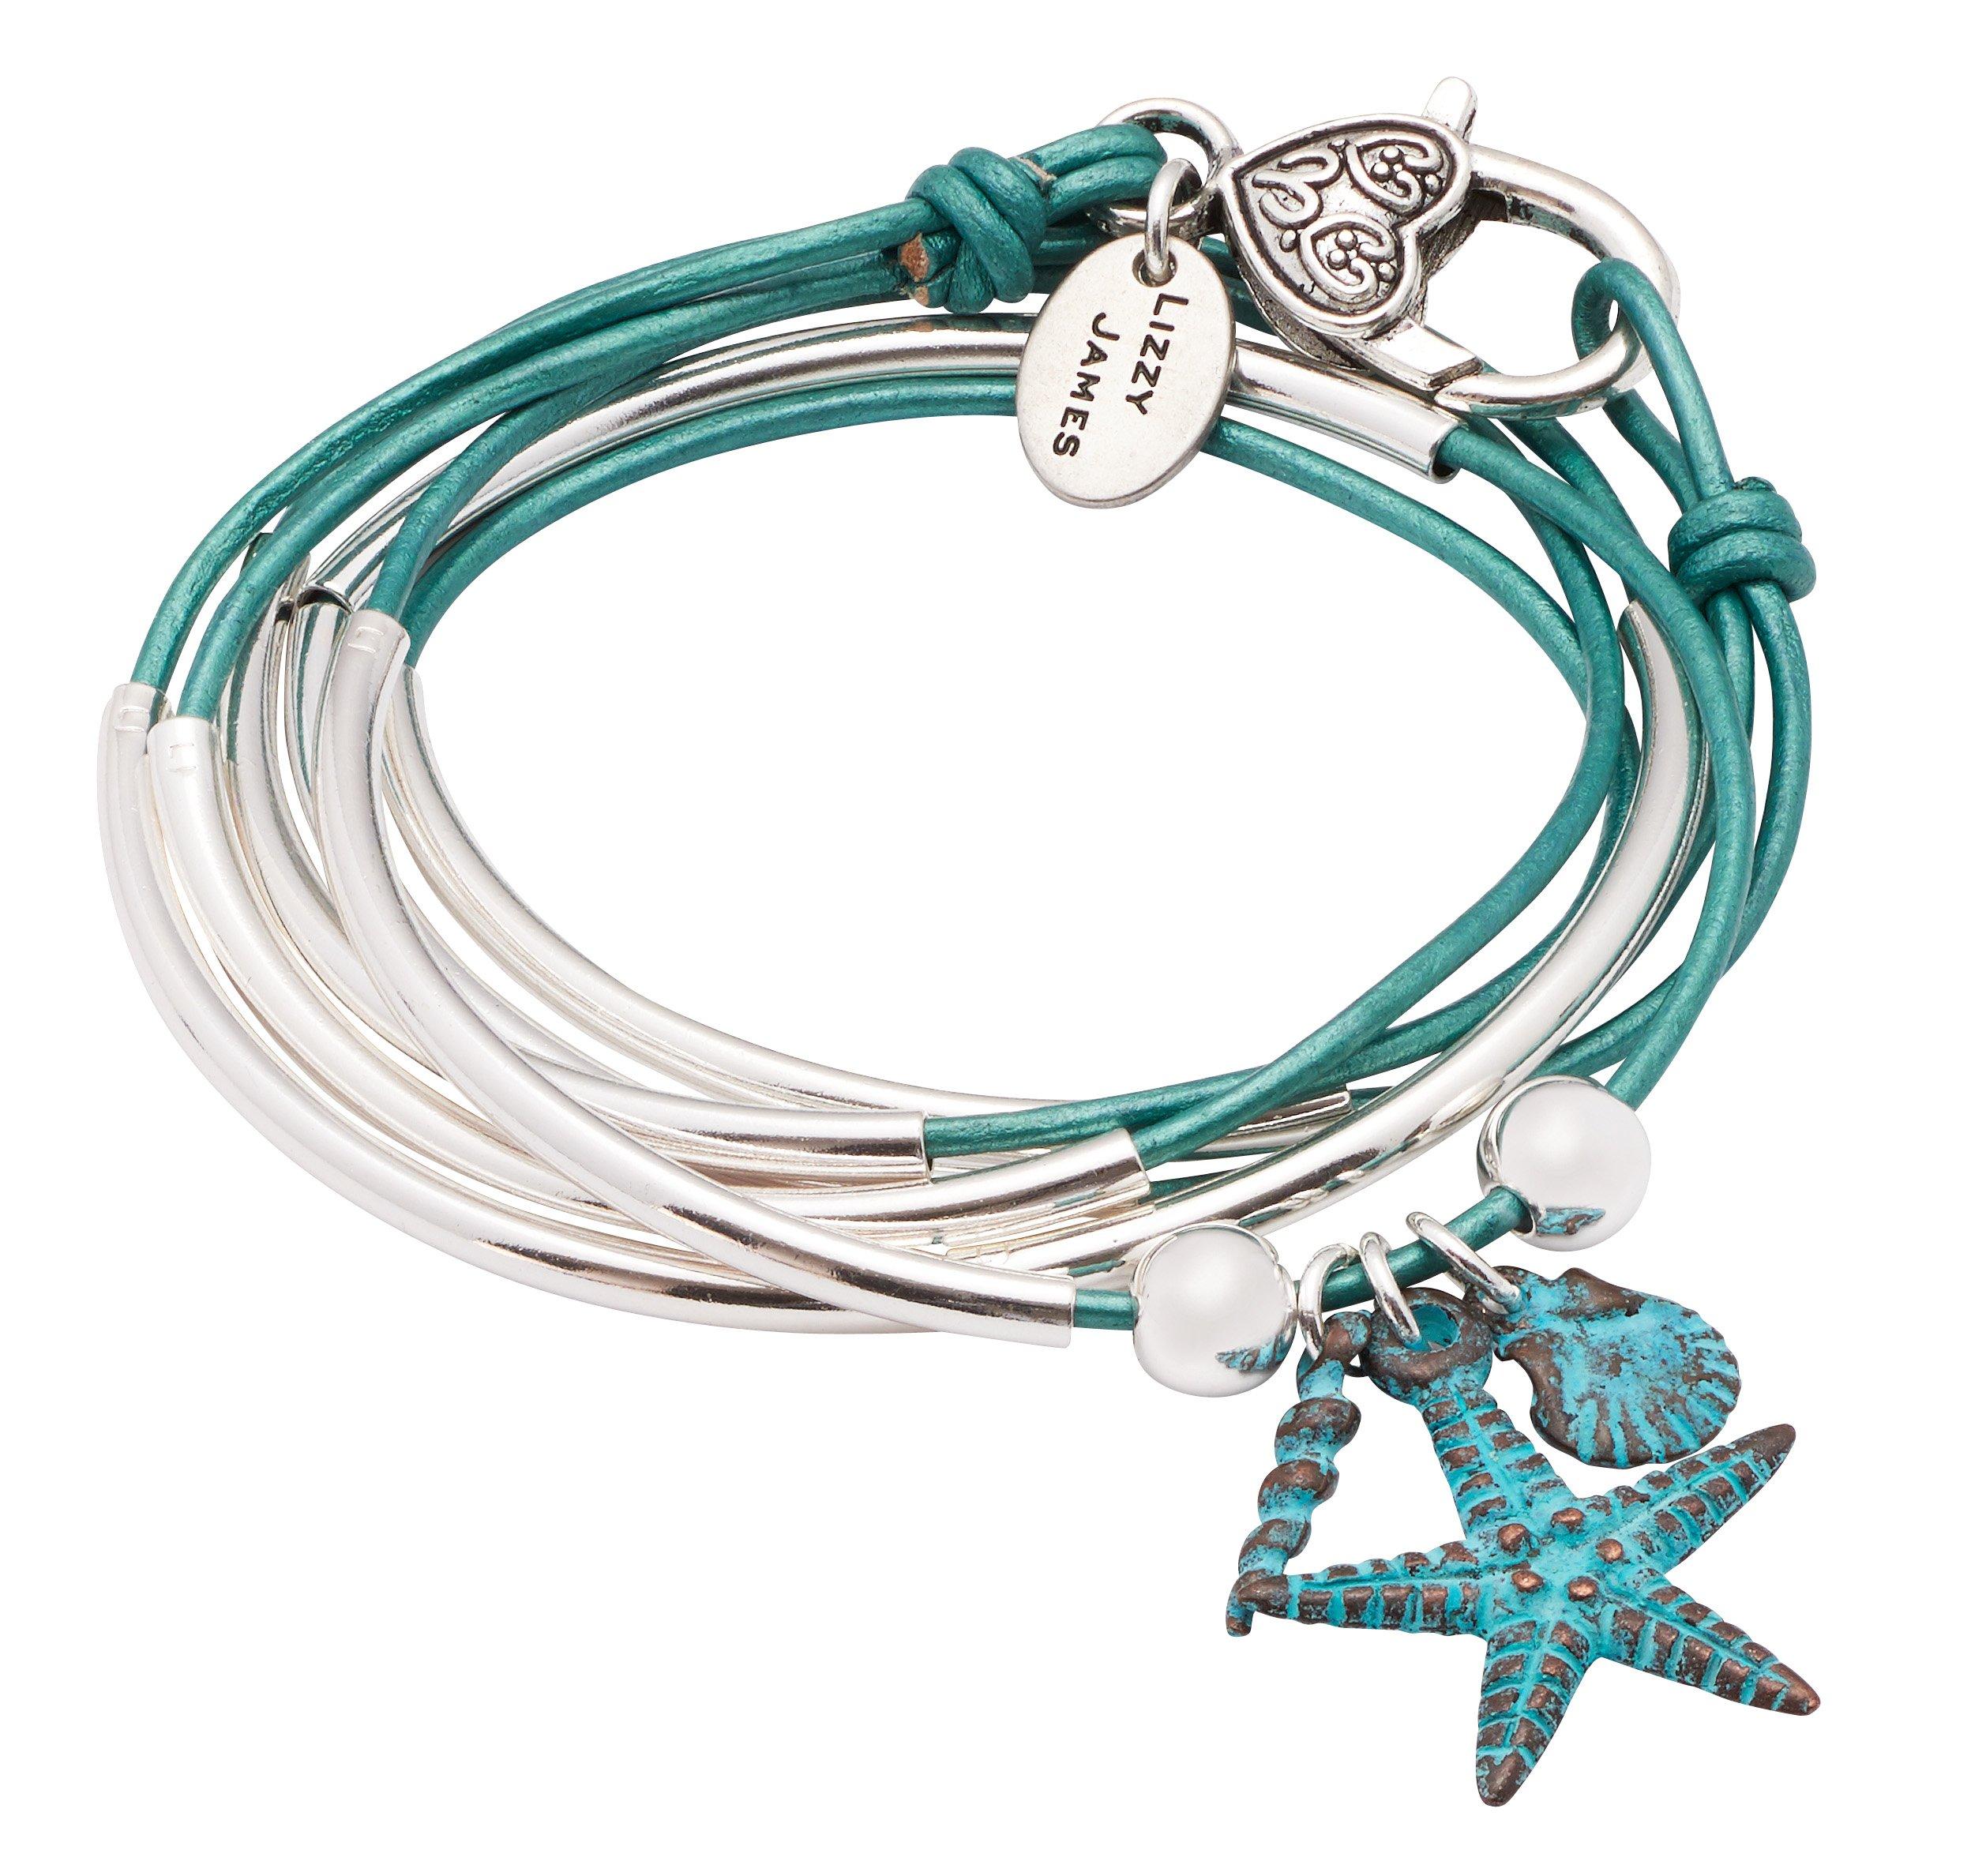 Lizzy James Girlfriend Wrap Silverplated 2 Strand Metallic Teal Leather Wrap Bracelet with Nautical Teal Charm Trio (Medium)